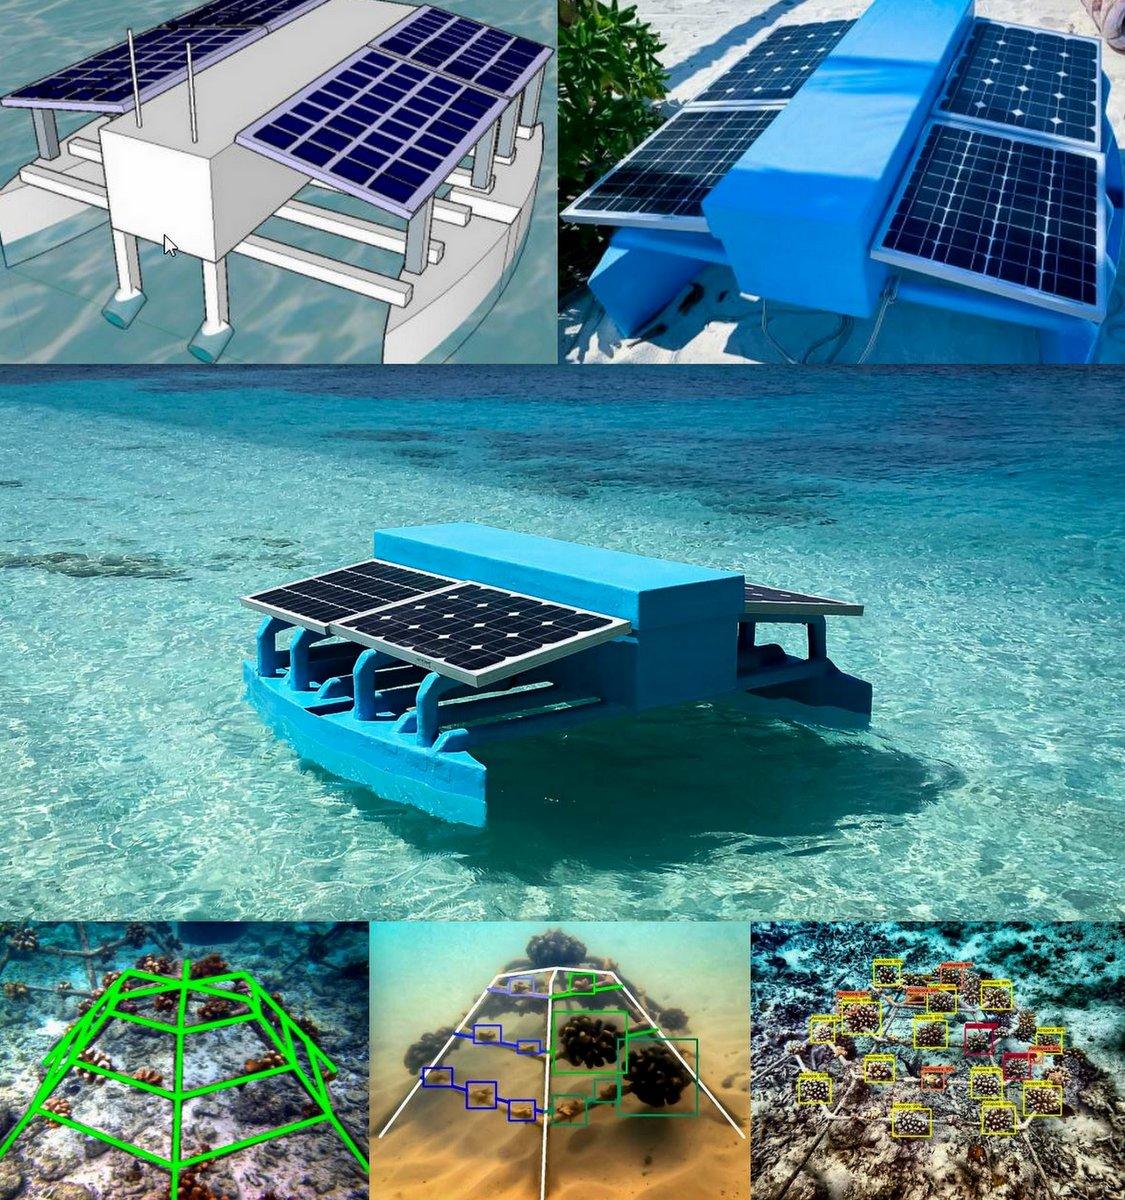 Marine Catamaran and AI Coral Detection collage employment vacancy robotics engineer